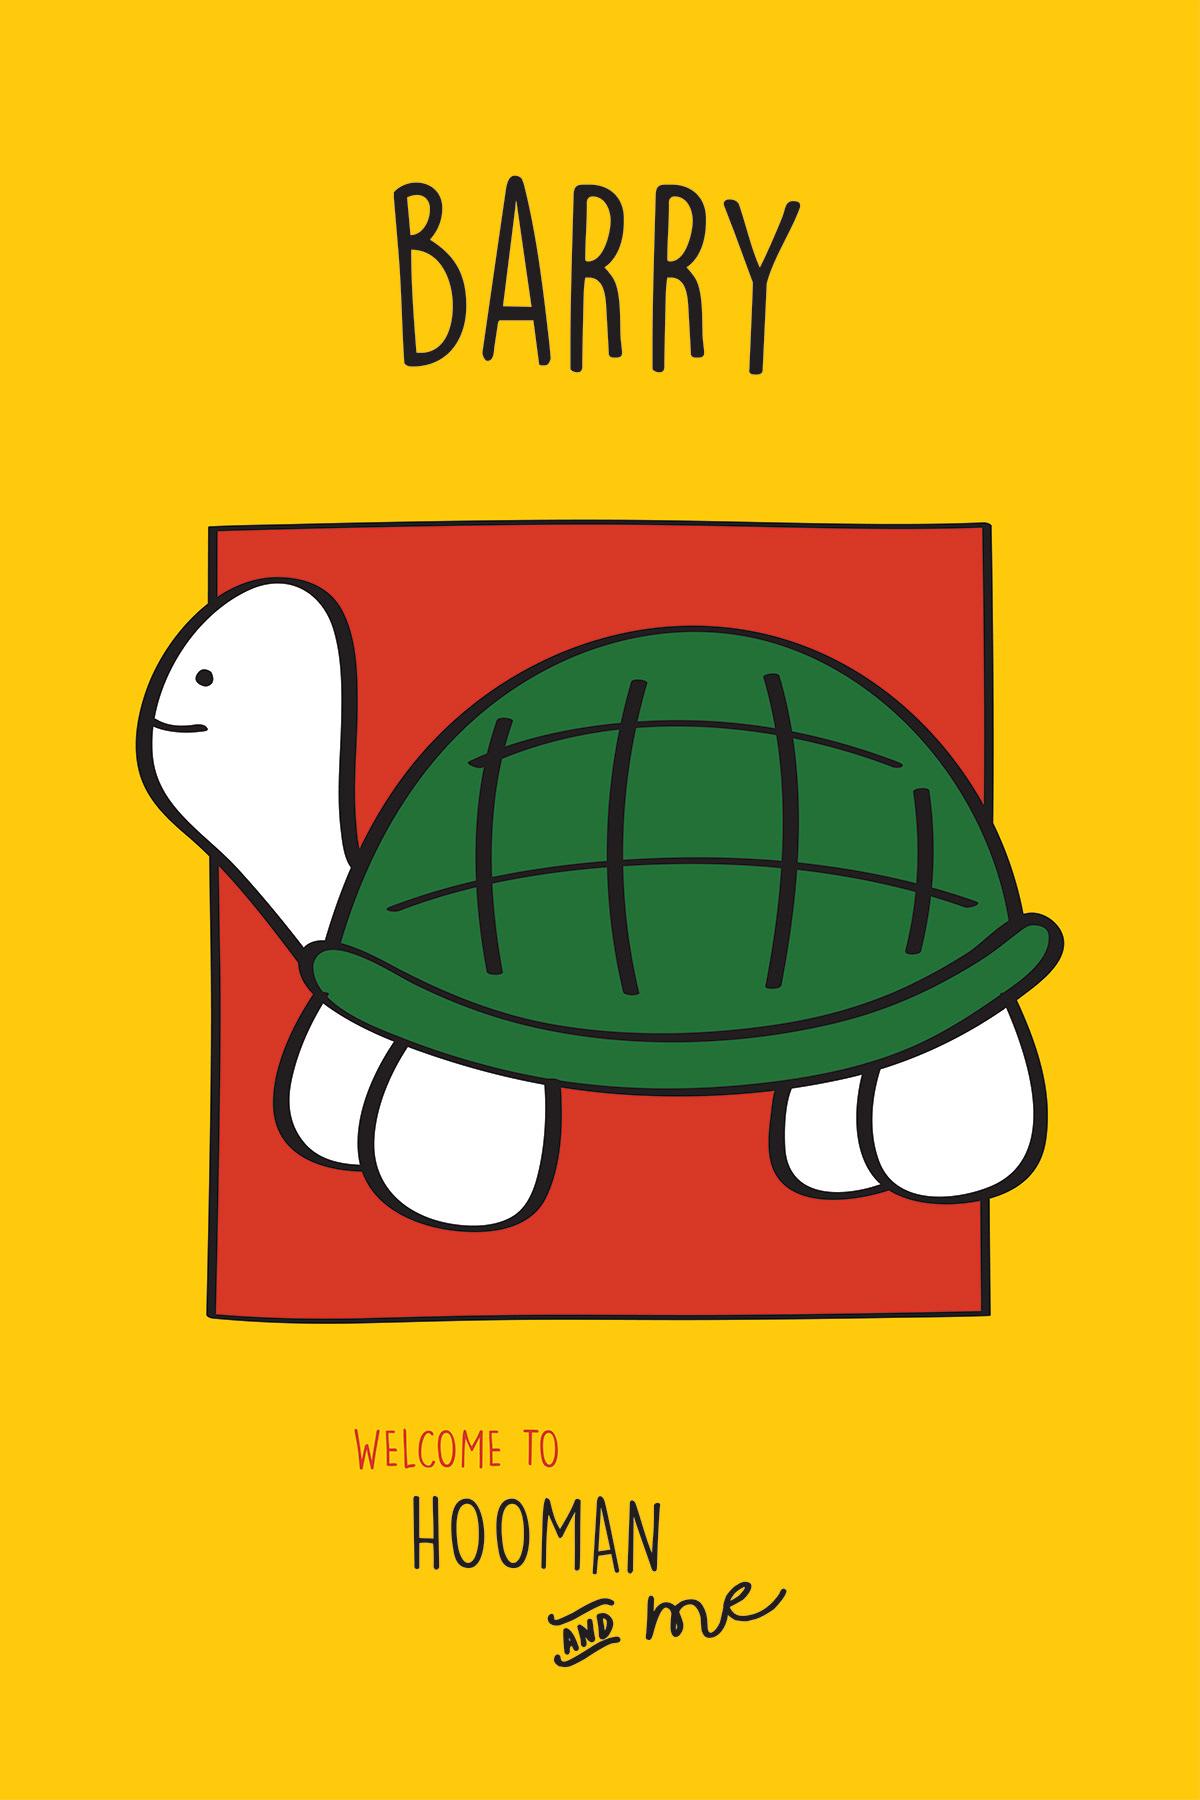 Character design  animals adobe illustrator ILLUSTRATION  sticker product Event branding